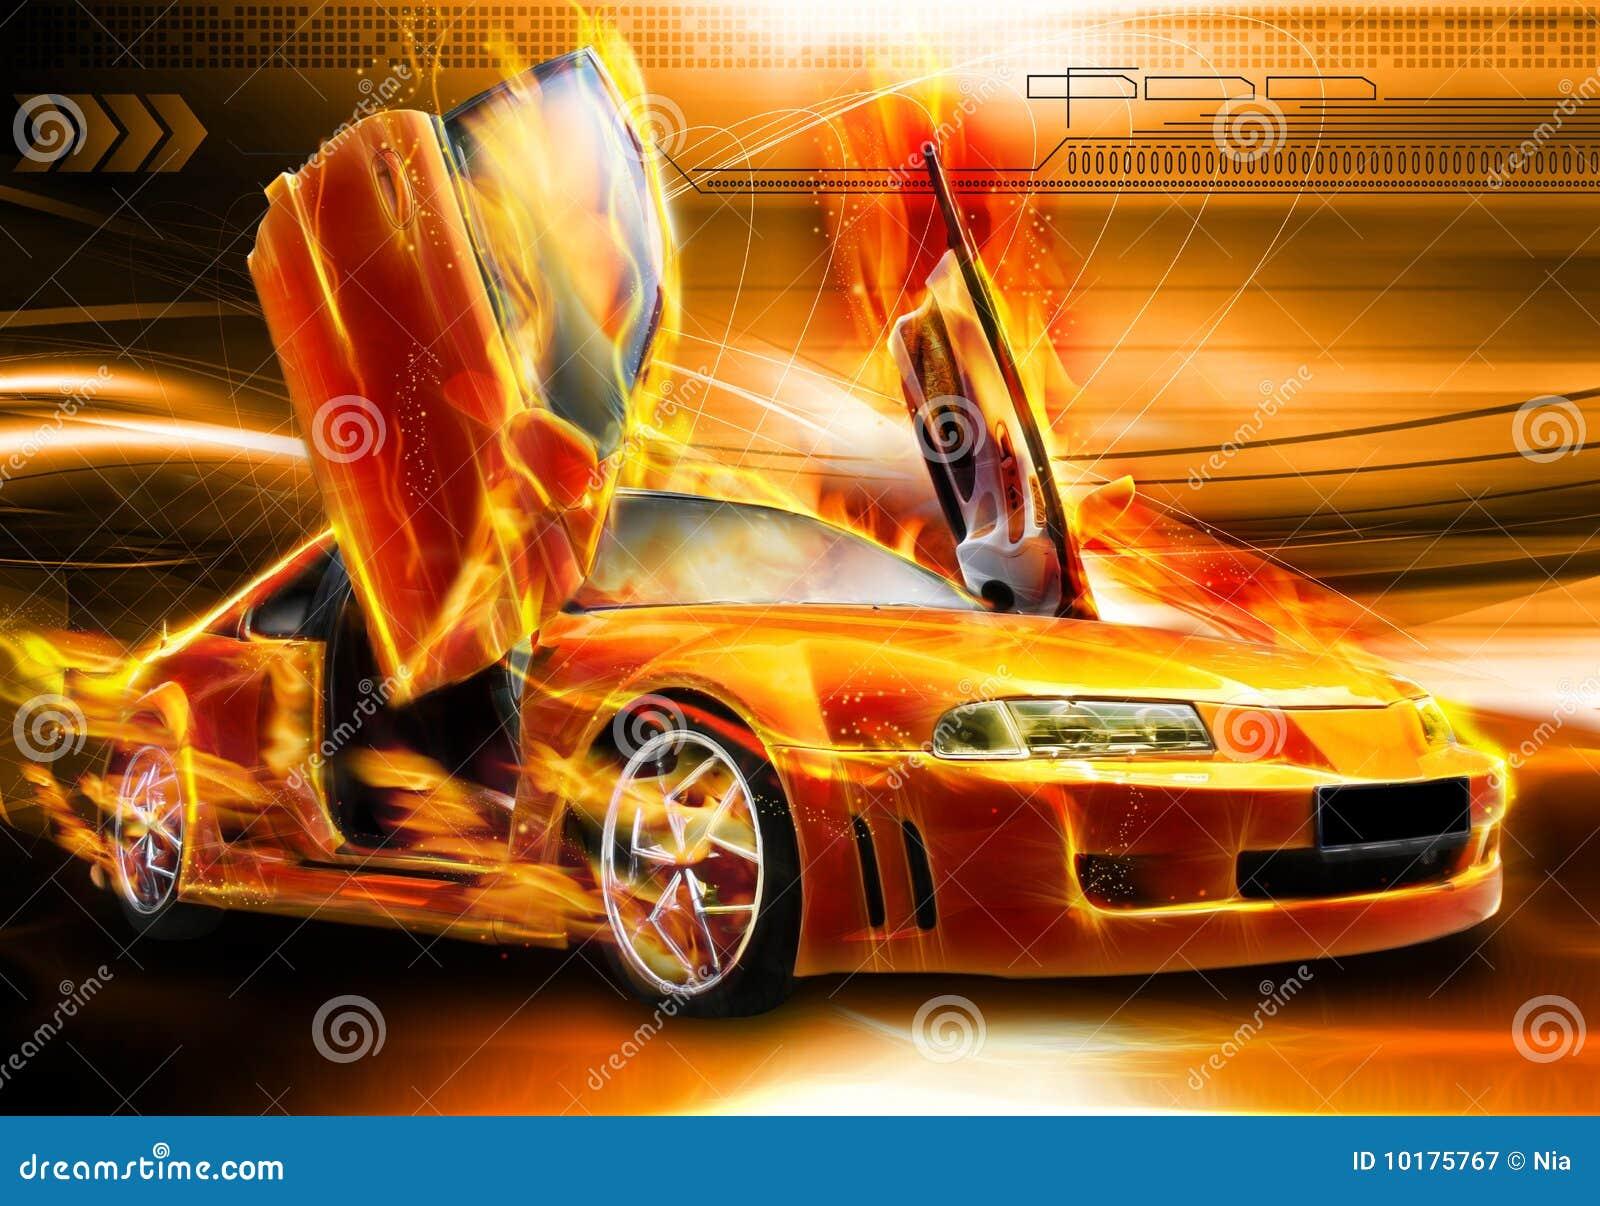 burning car background stock illustration. illustration of night